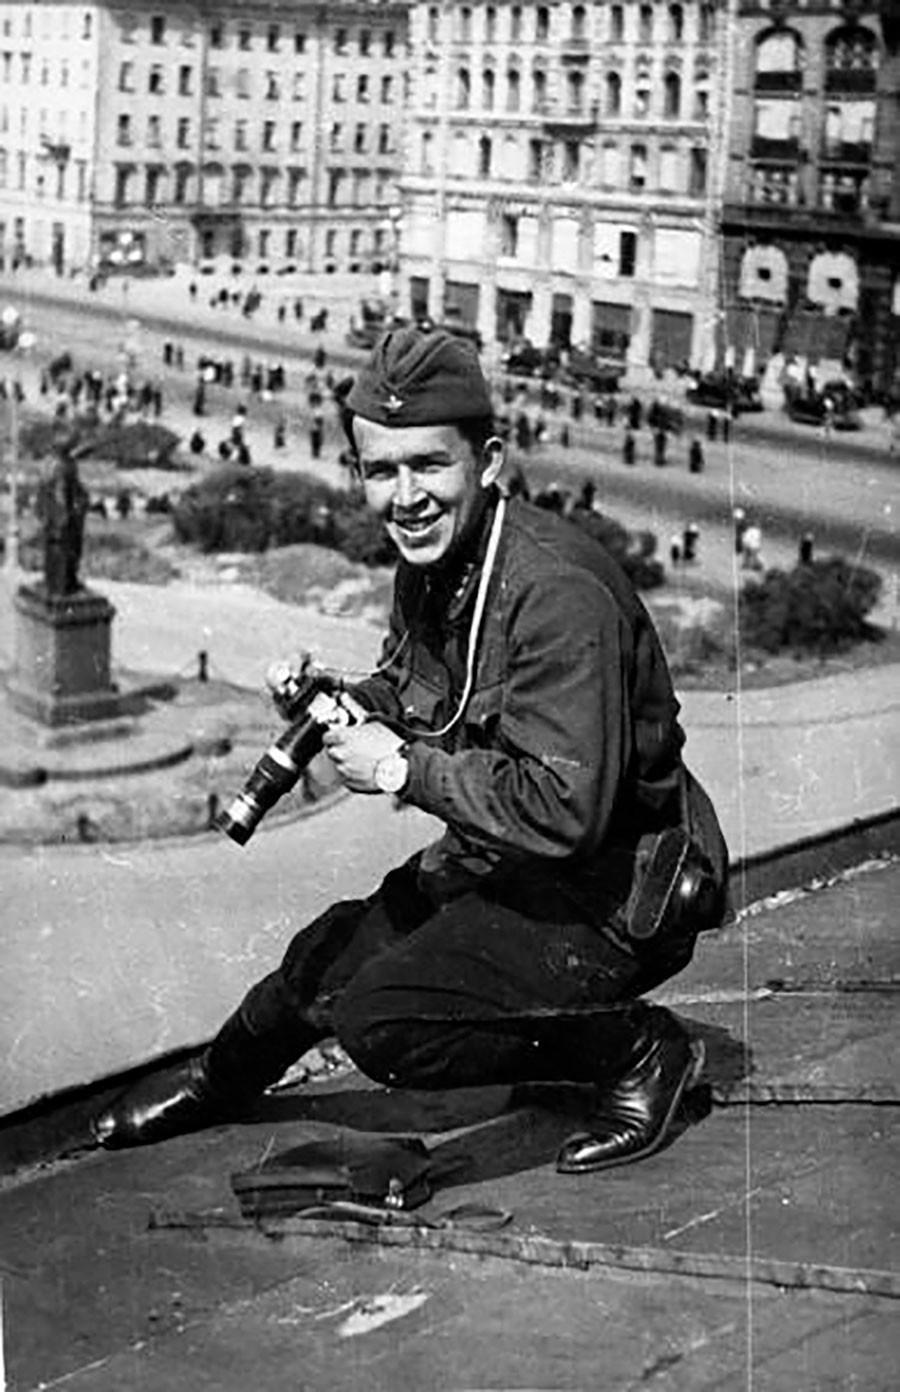 Vsevolod Tarasevich at work in Leningrad, 1942